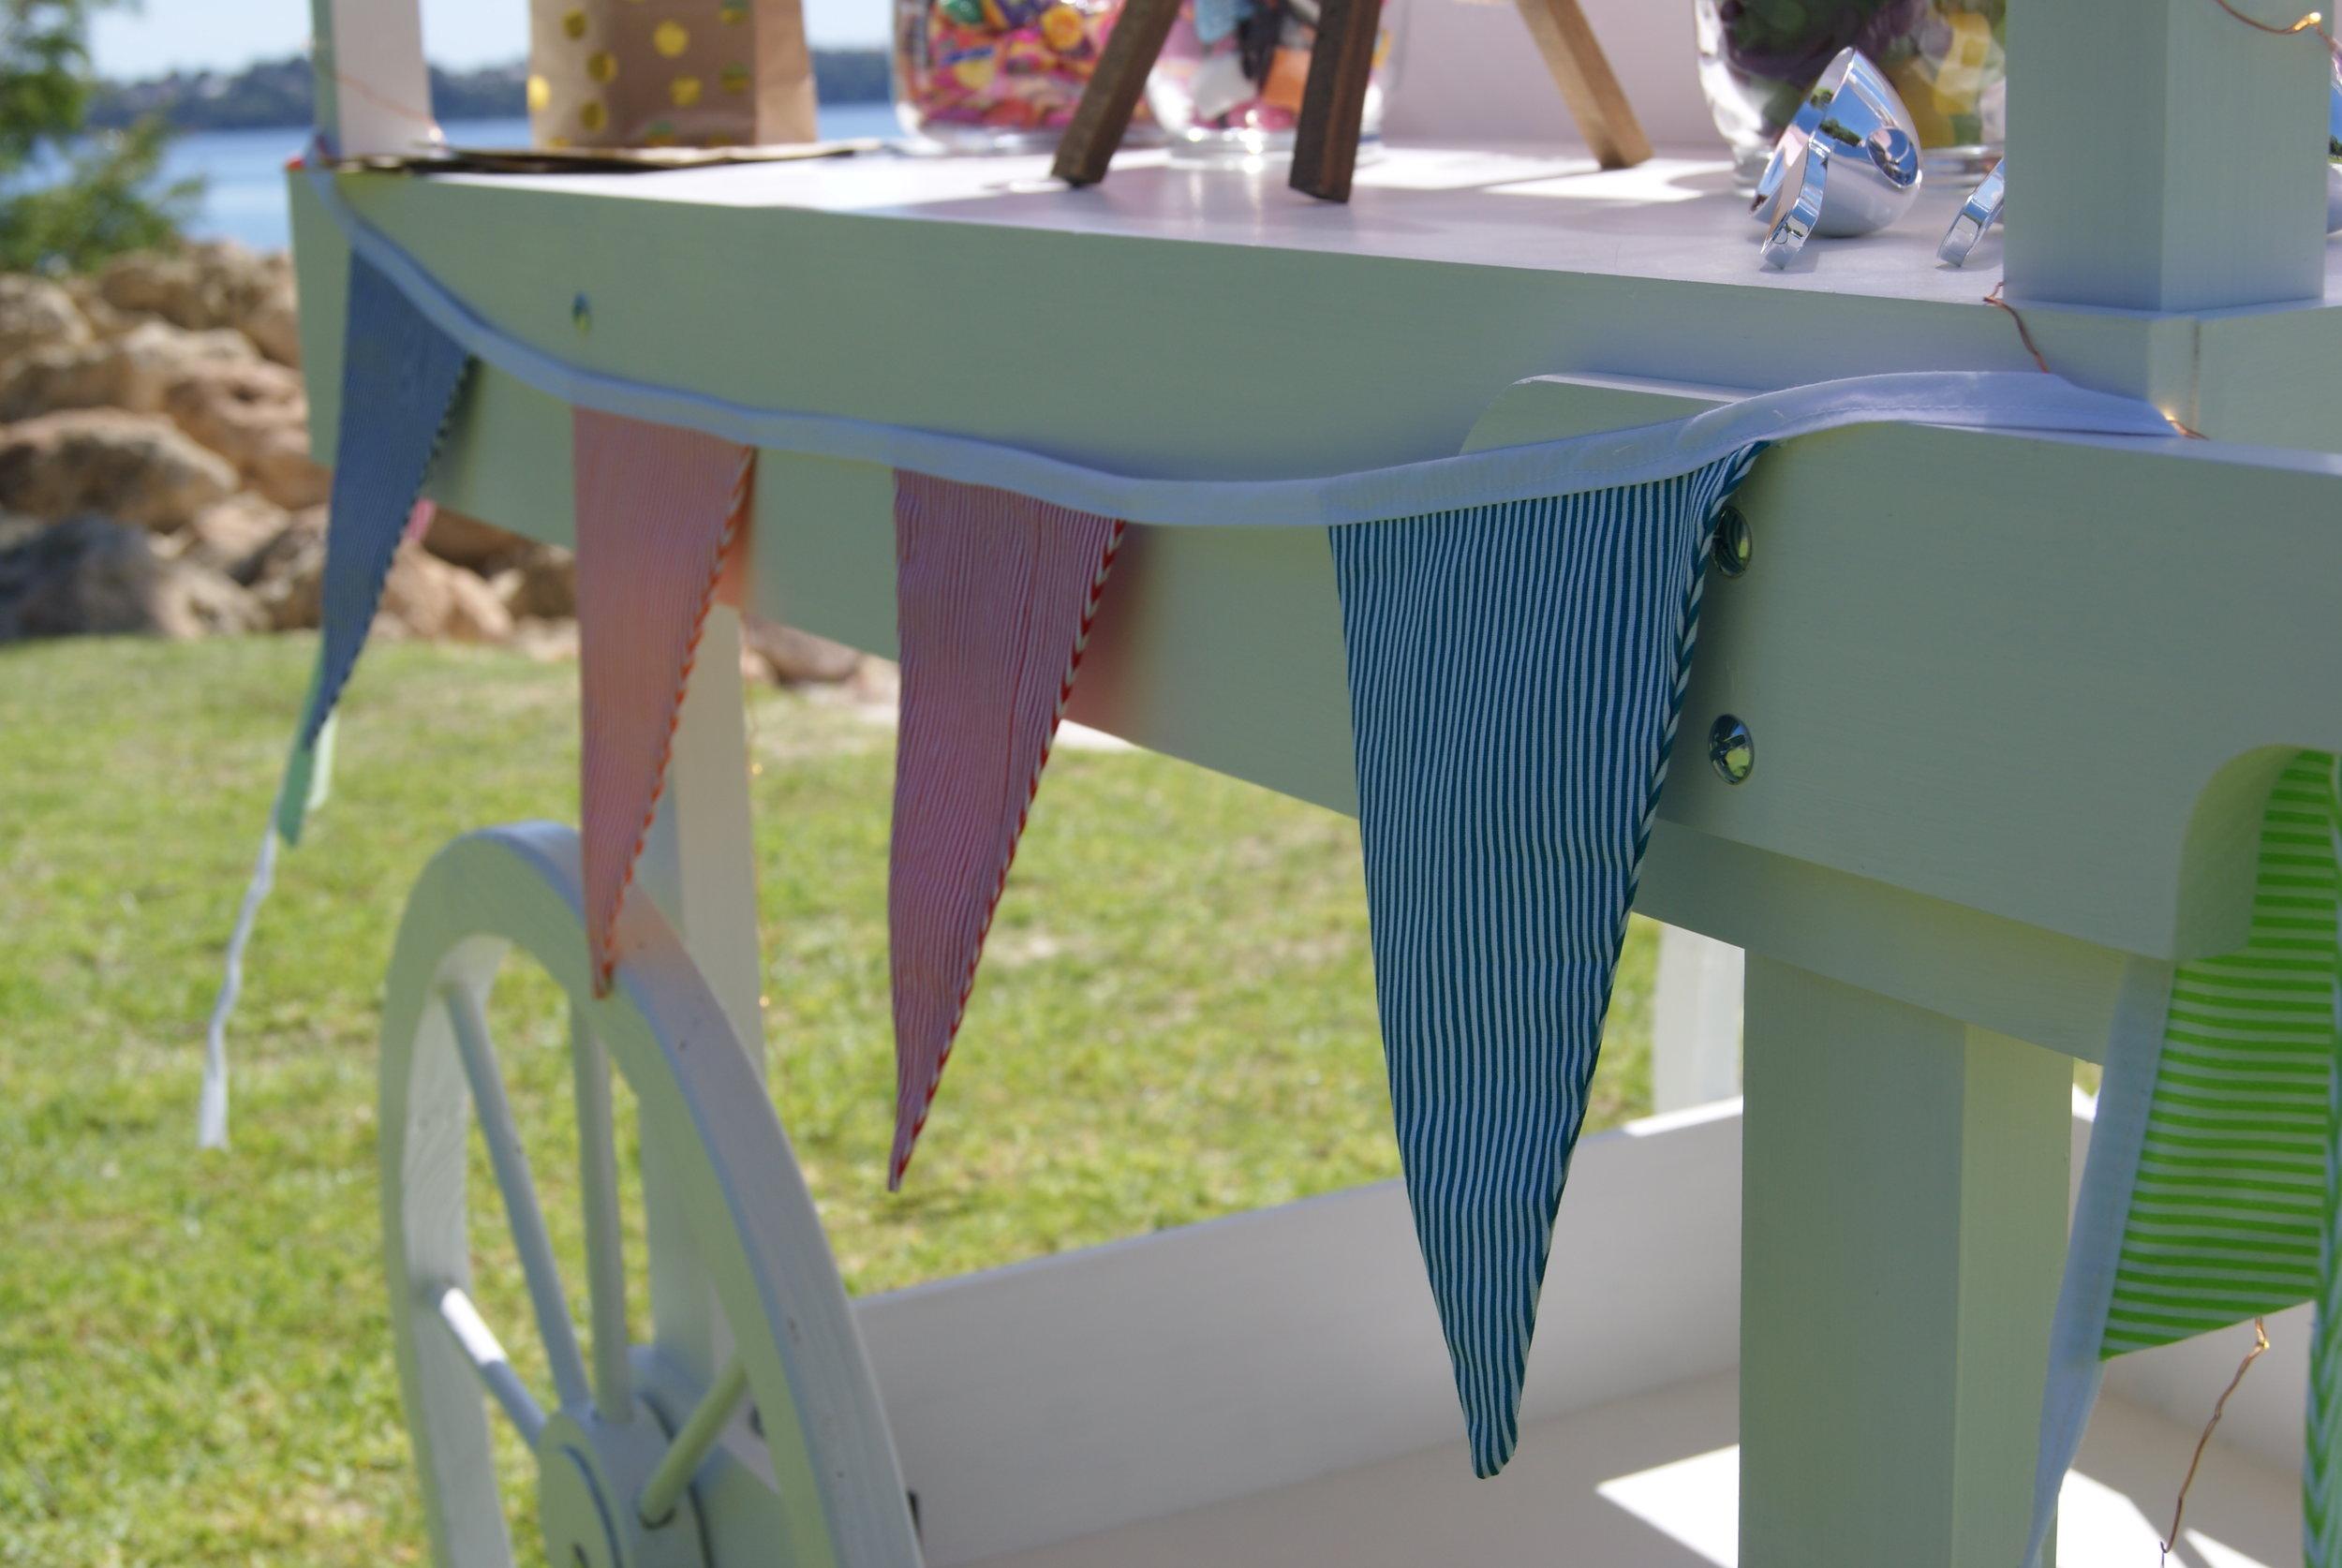 Bunting_Multicolour_Closeup_Little Lolly Cart.JPG